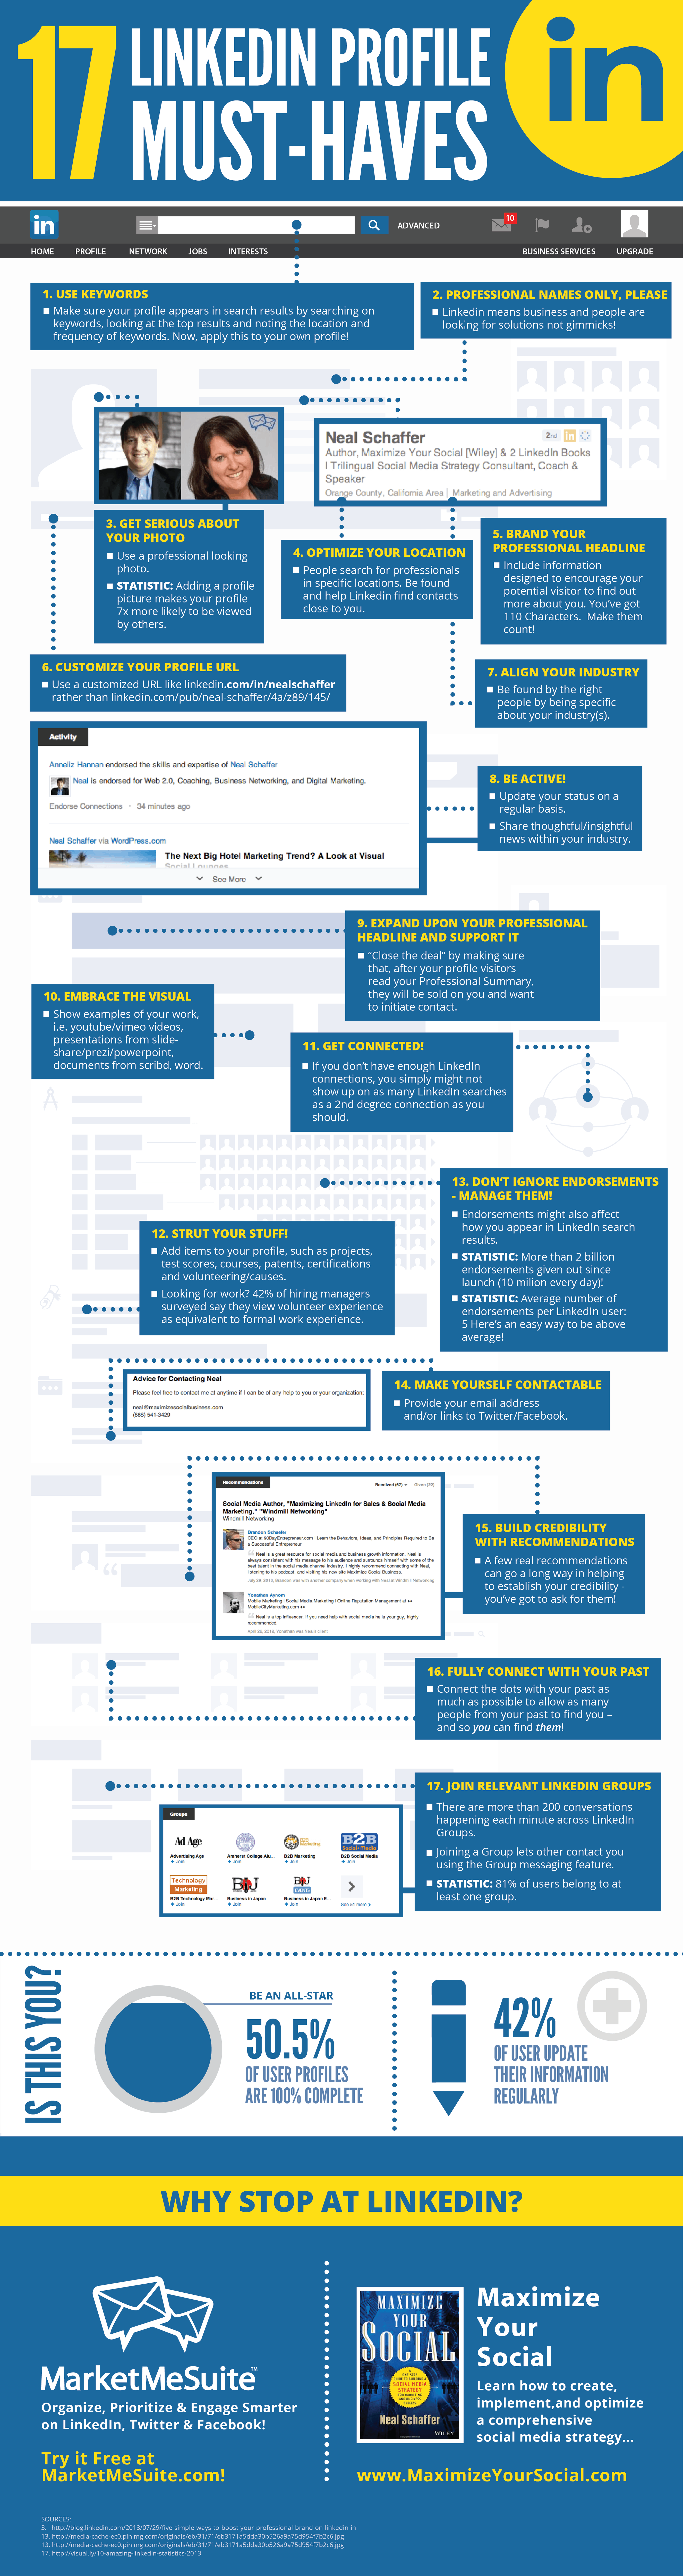 linkedin profile tips pdf